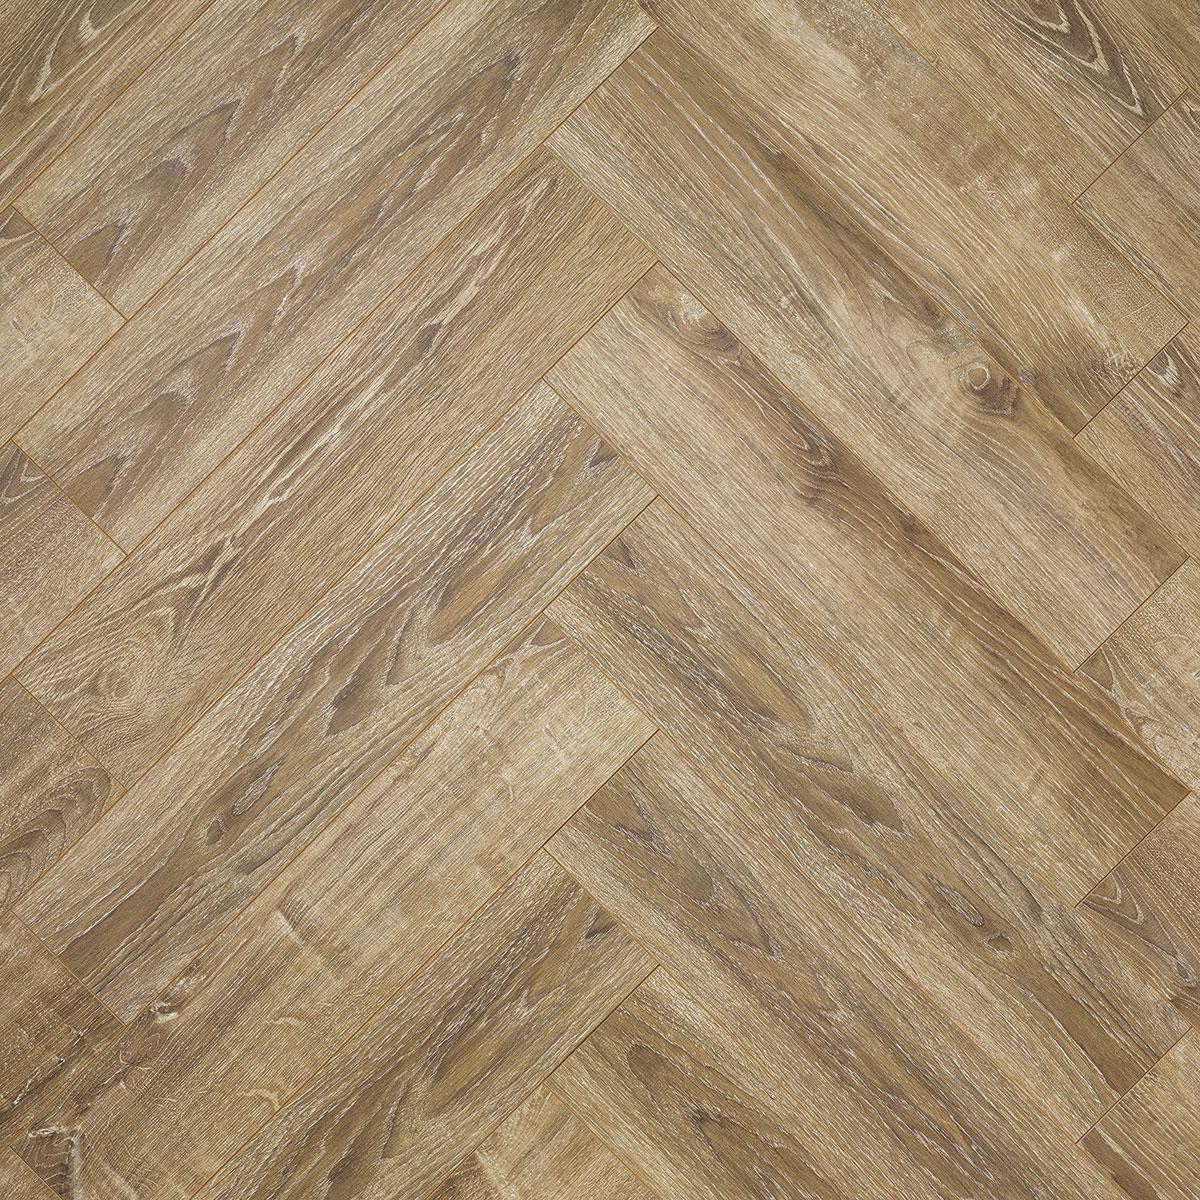 john murphy carpets wood floors alternative commercial. Black Bedroom Furniture Sets. Home Design Ideas